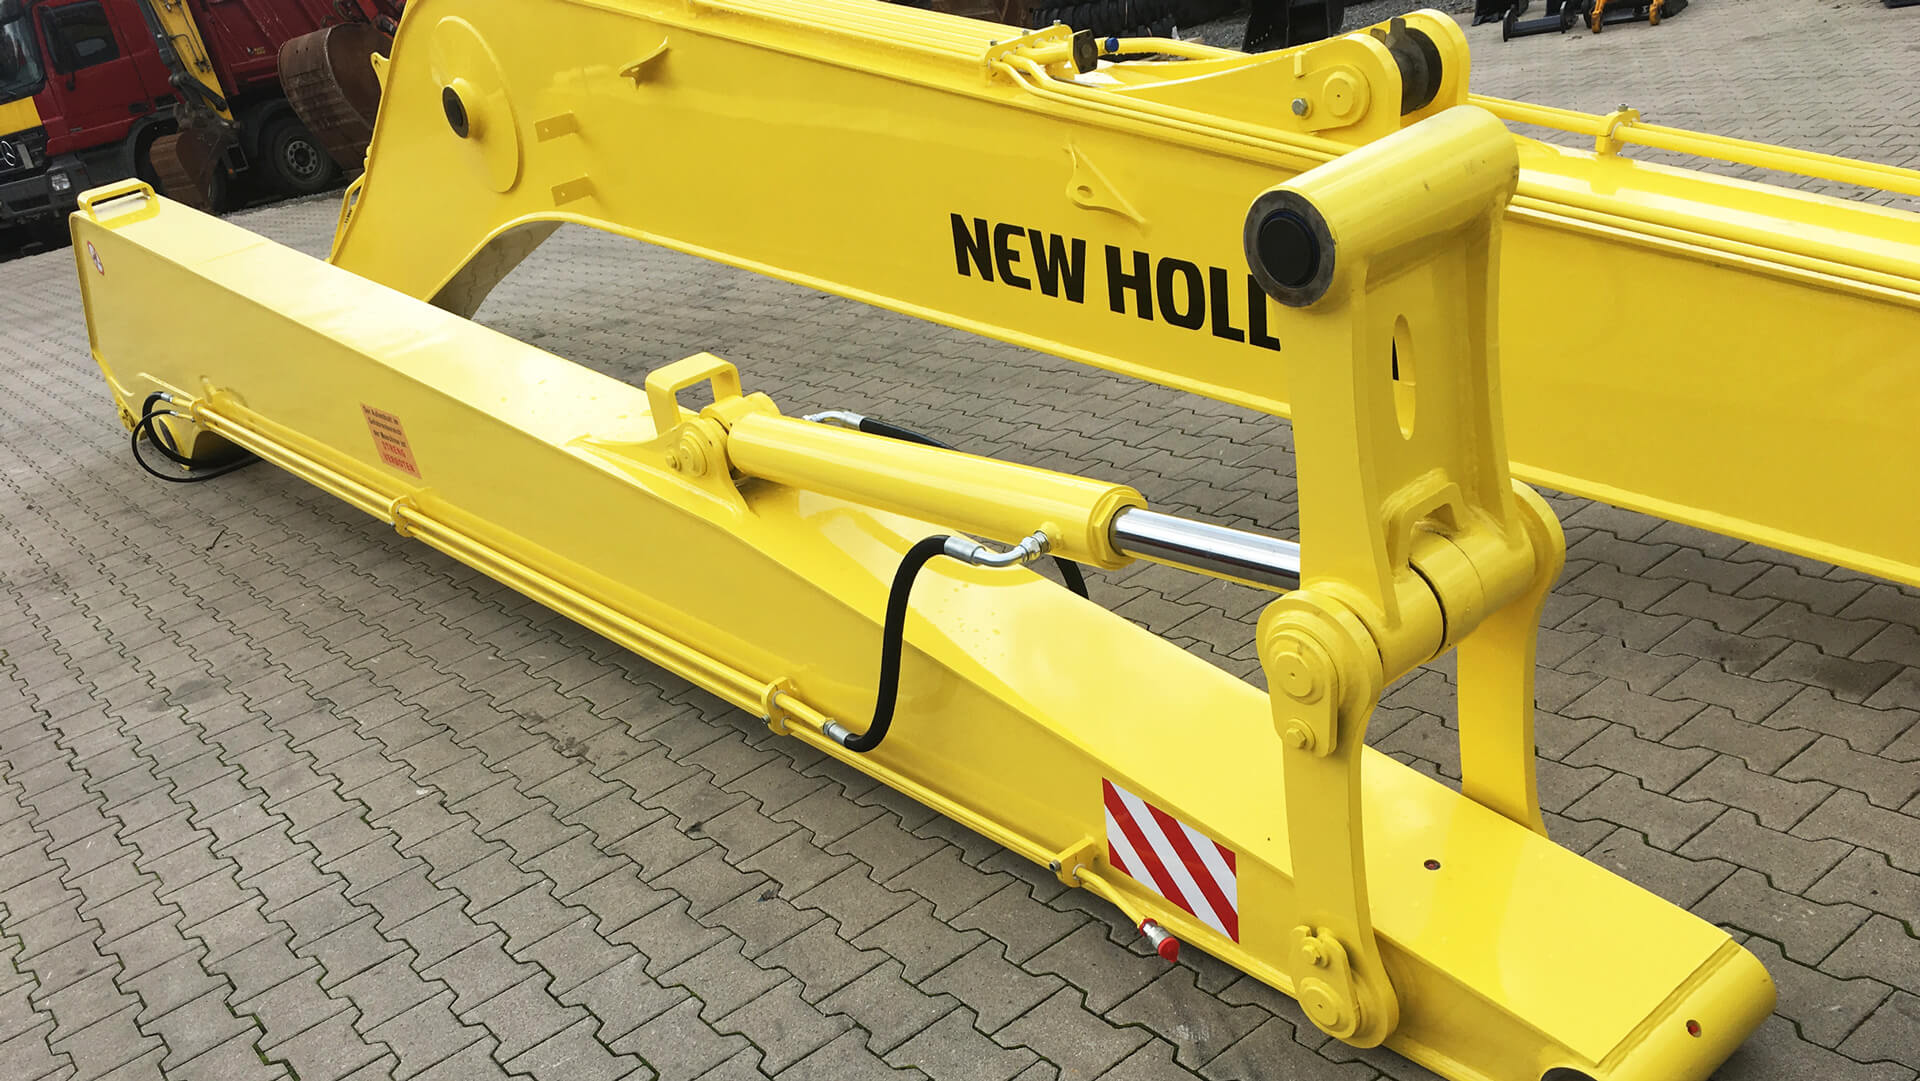 16m Long Reach für New Holland E305 C